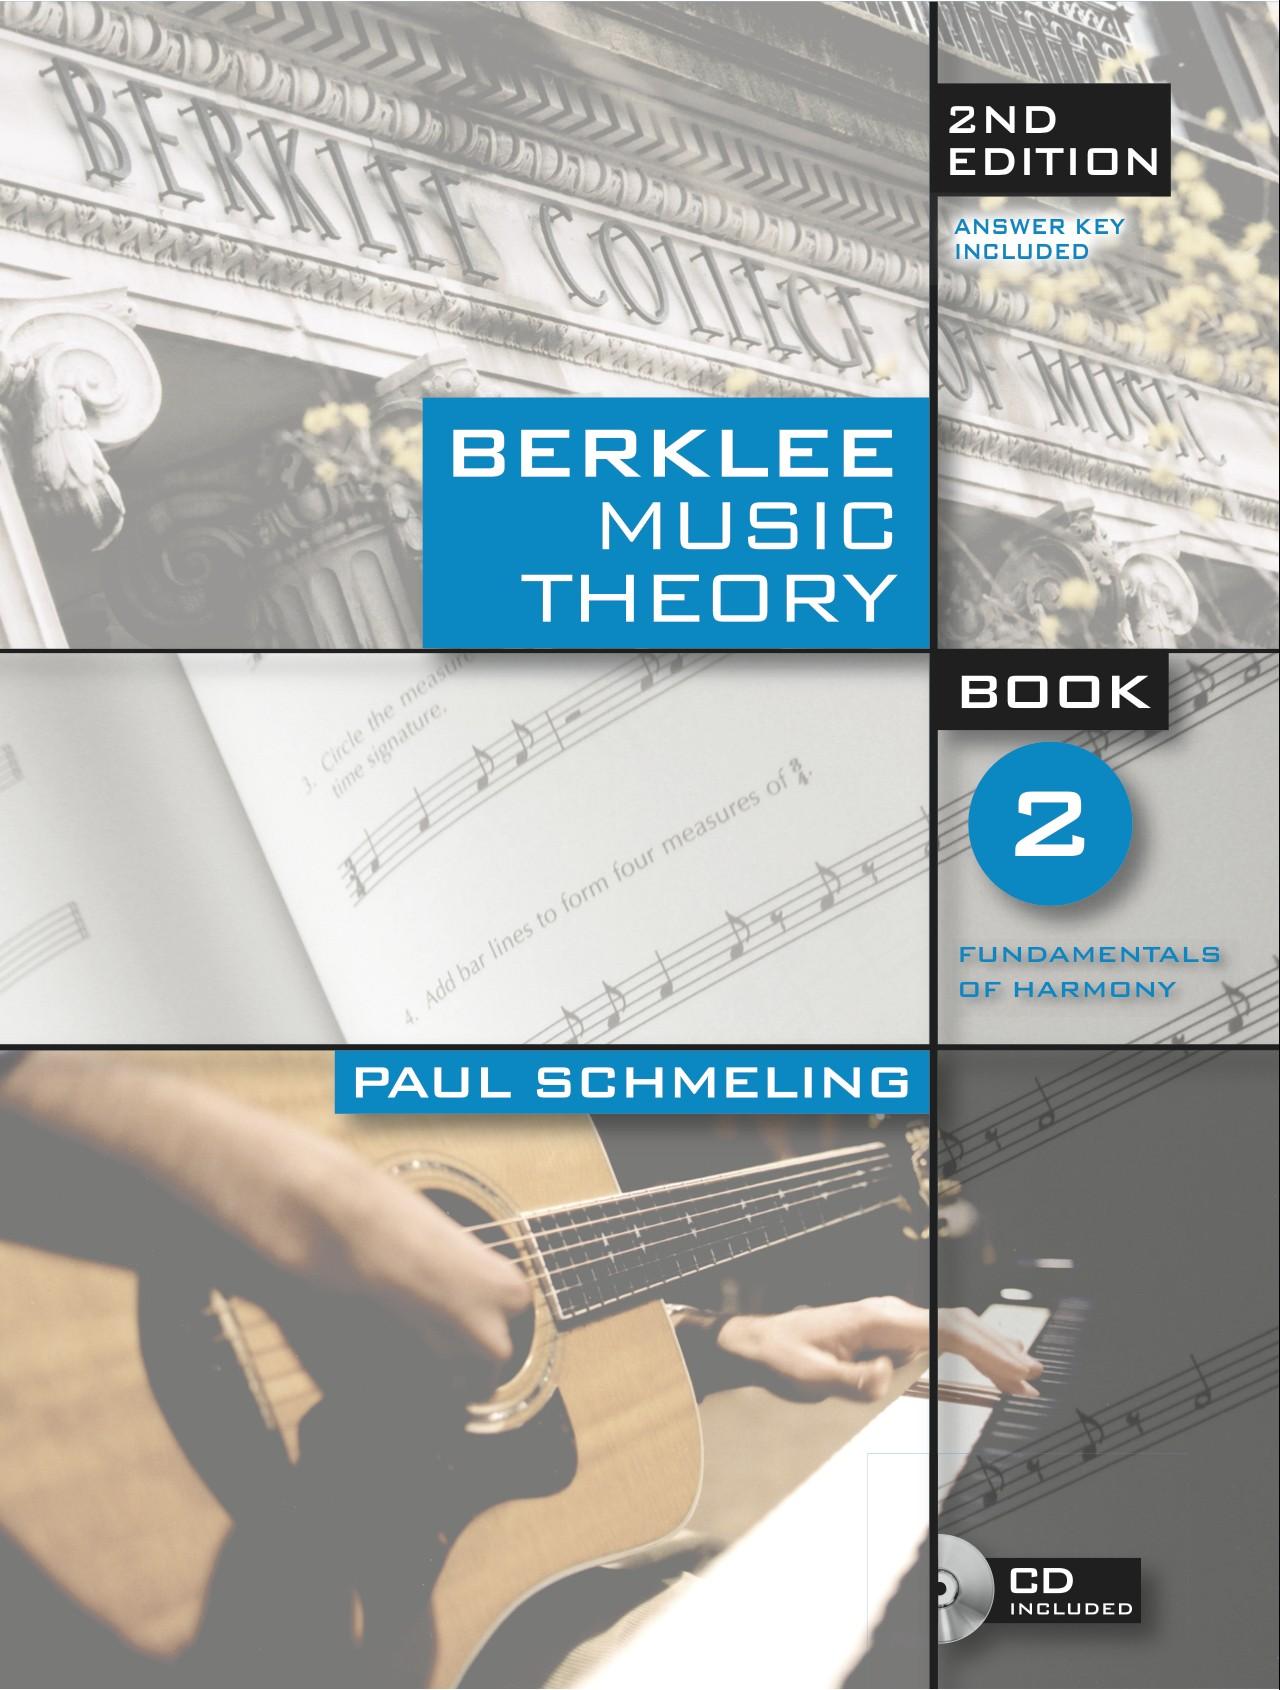 Berklee Music Theory Book 2 €� Second Edition:fundamentals Of Harmony